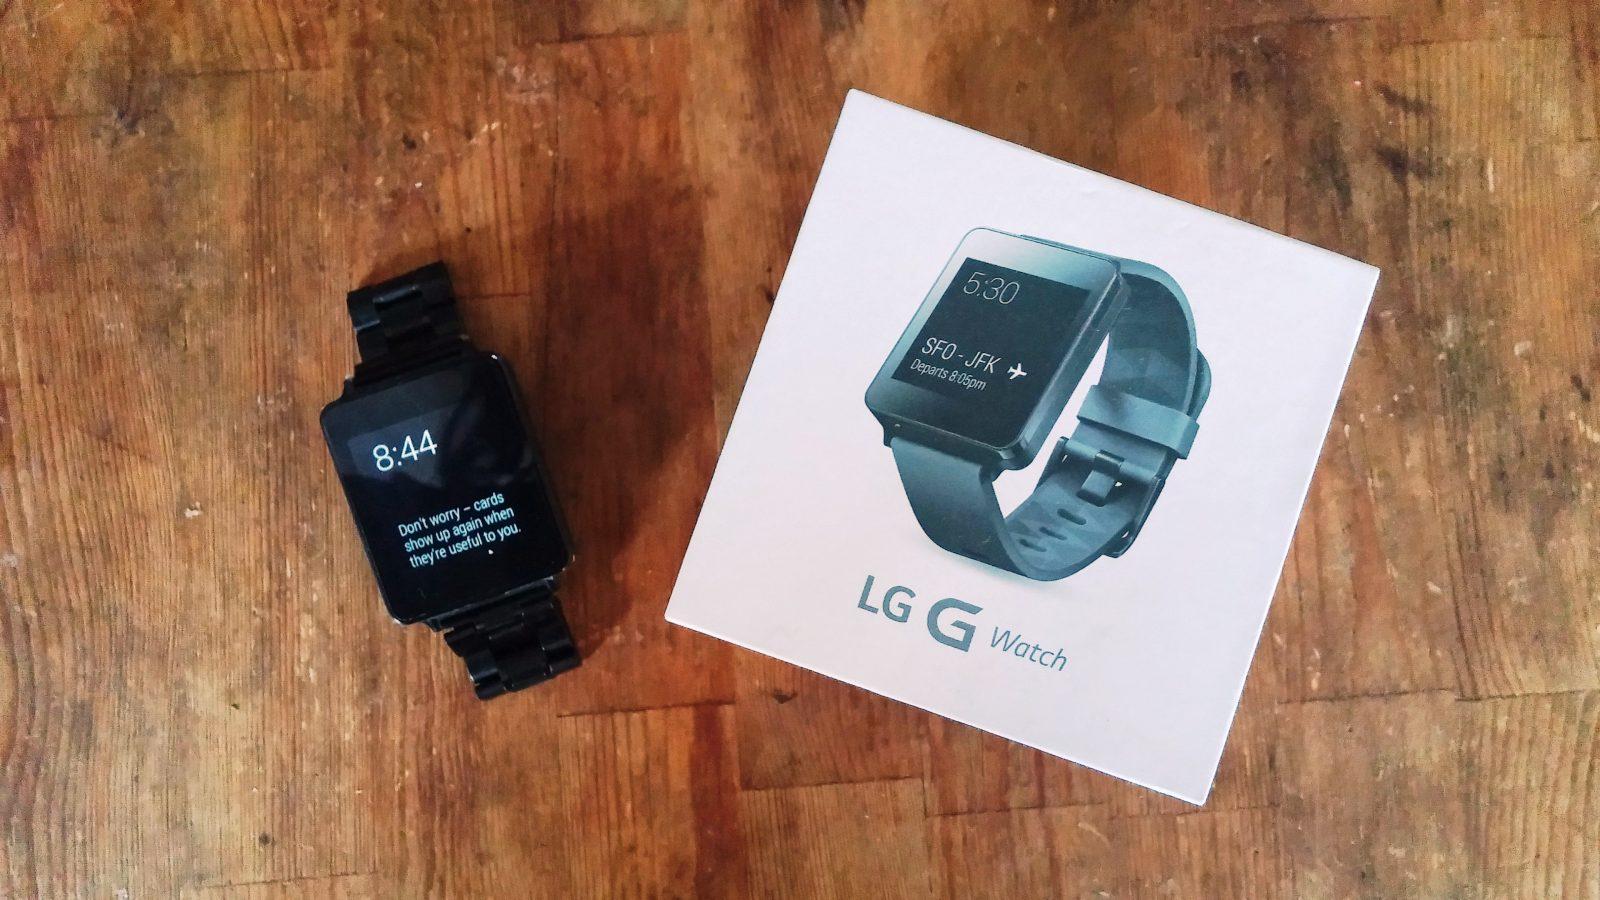 LG G Watch Review (Smartwatch) Google Android Wear - Cruz (7)